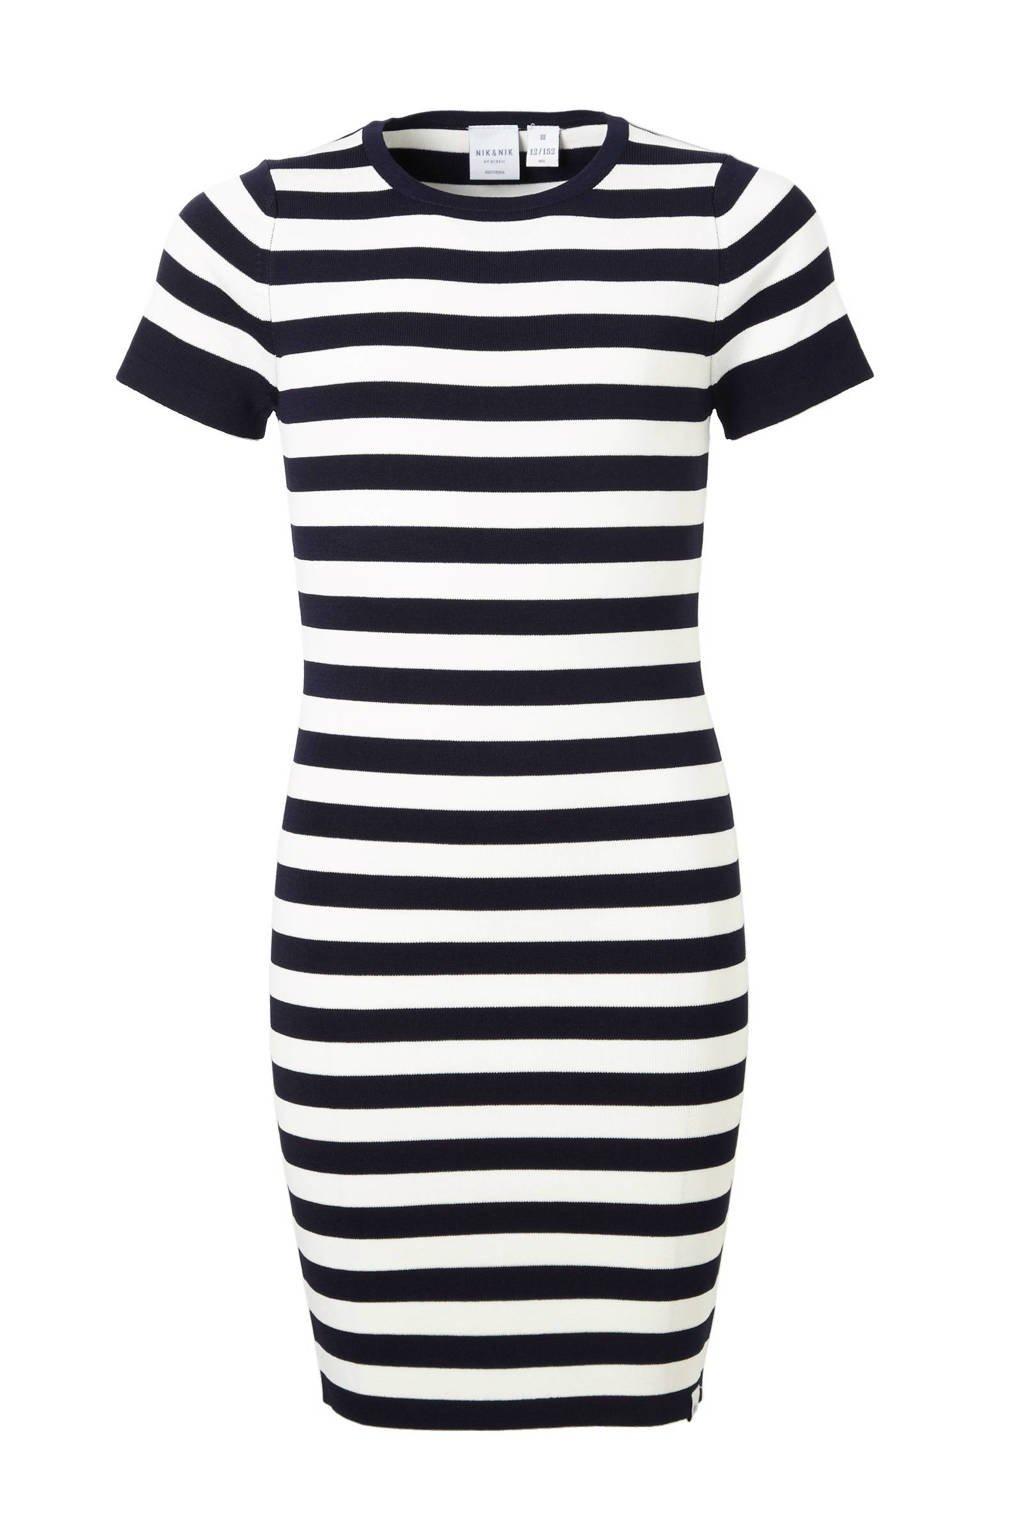 41f5457683468a NIK NIK jurk Jolie d.blauw offwhite